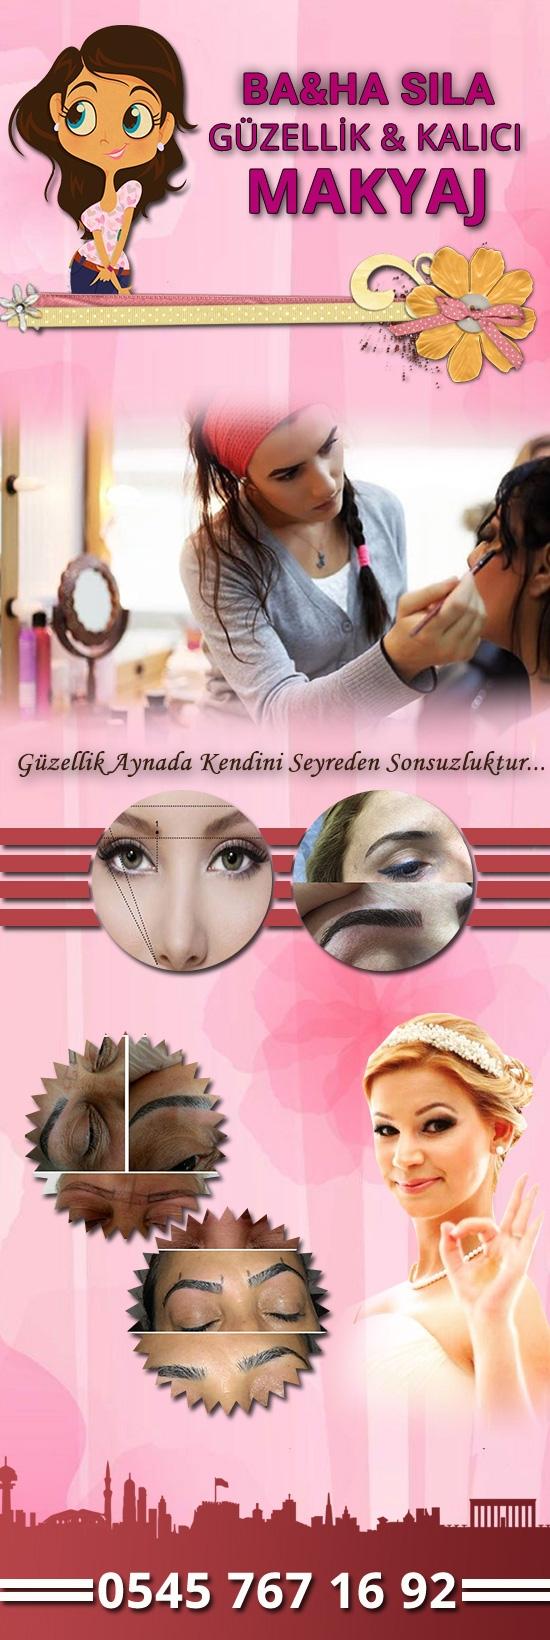 Baha Sıla Ceylan Güzellik Merkezi Eryaman / Ankara